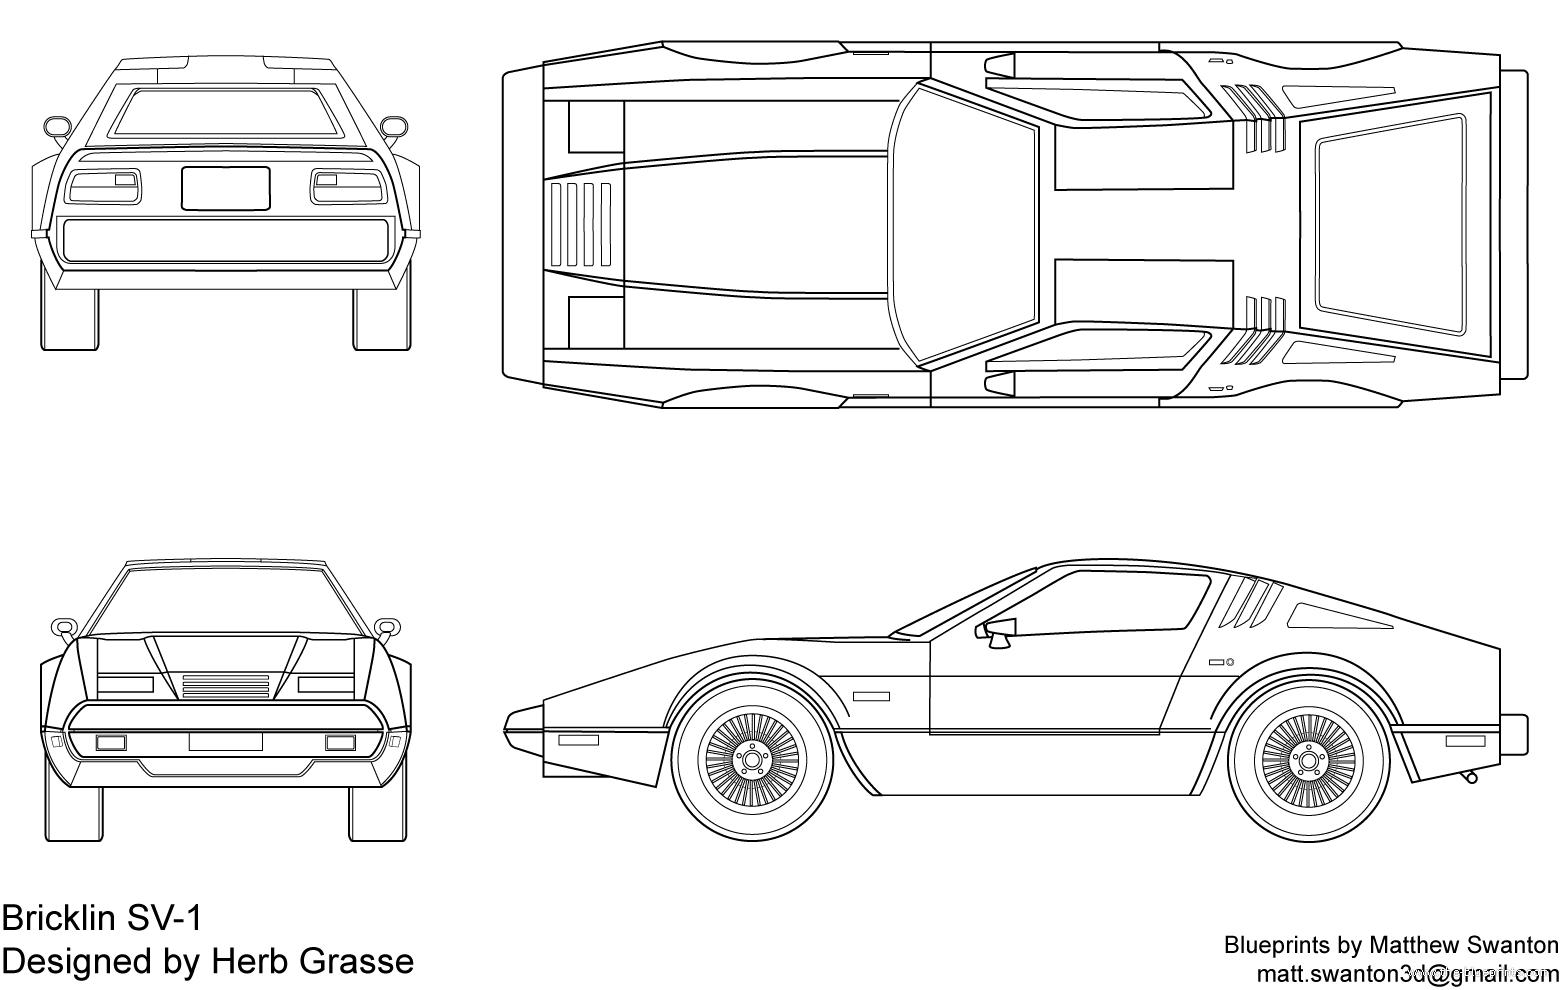 Blueprints > Cars > Various Cars > Bricklin SV-1